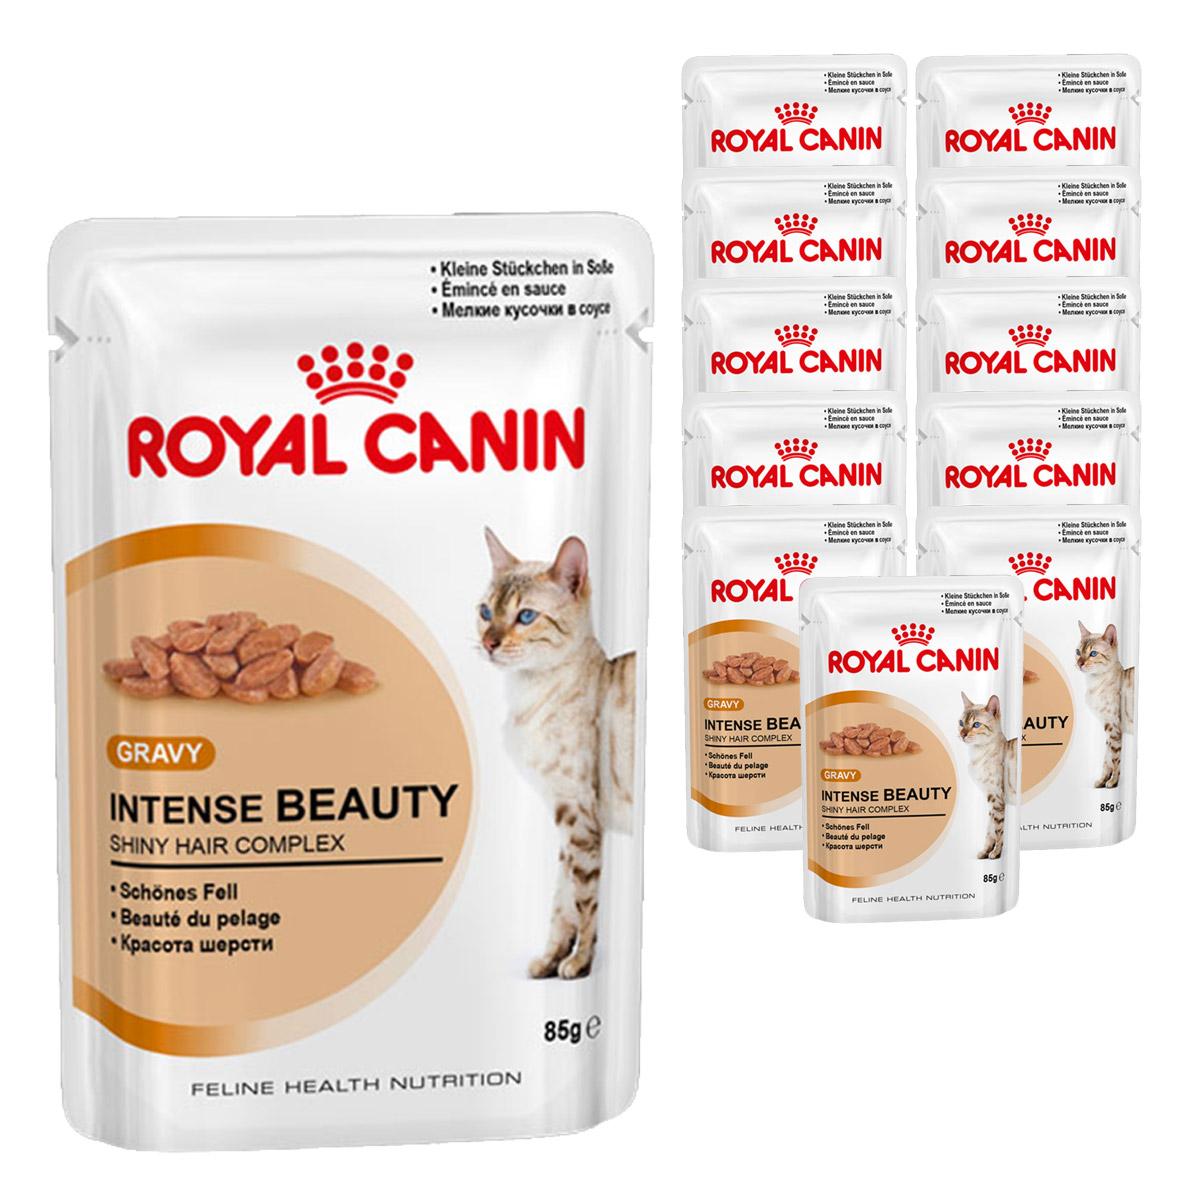 royal canin katzenfutter g nstig kaufen bei zooroyal. Black Bedroom Furniture Sets. Home Design Ideas